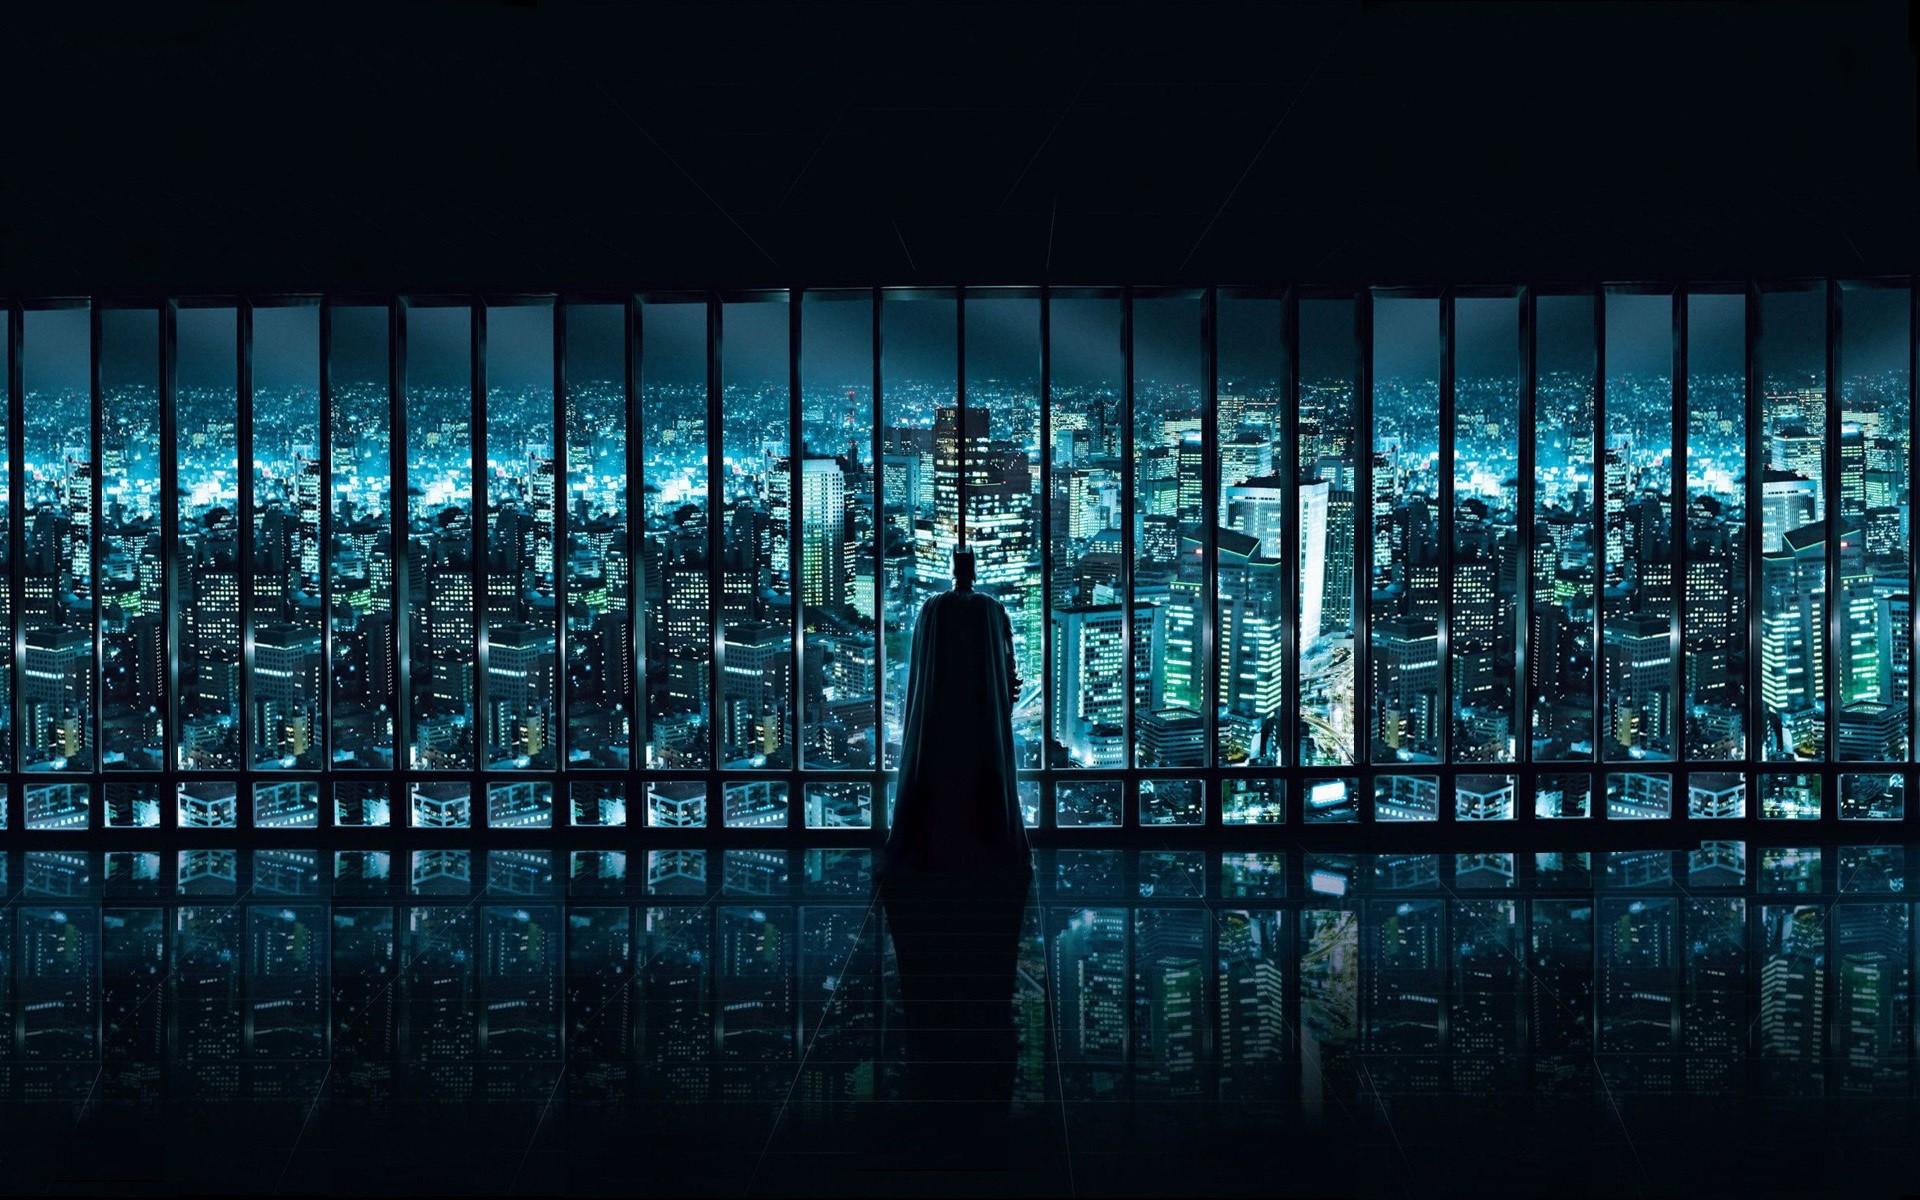 Batman desktop wallpaper widescreen wallpapersafari for Wallpaper sites